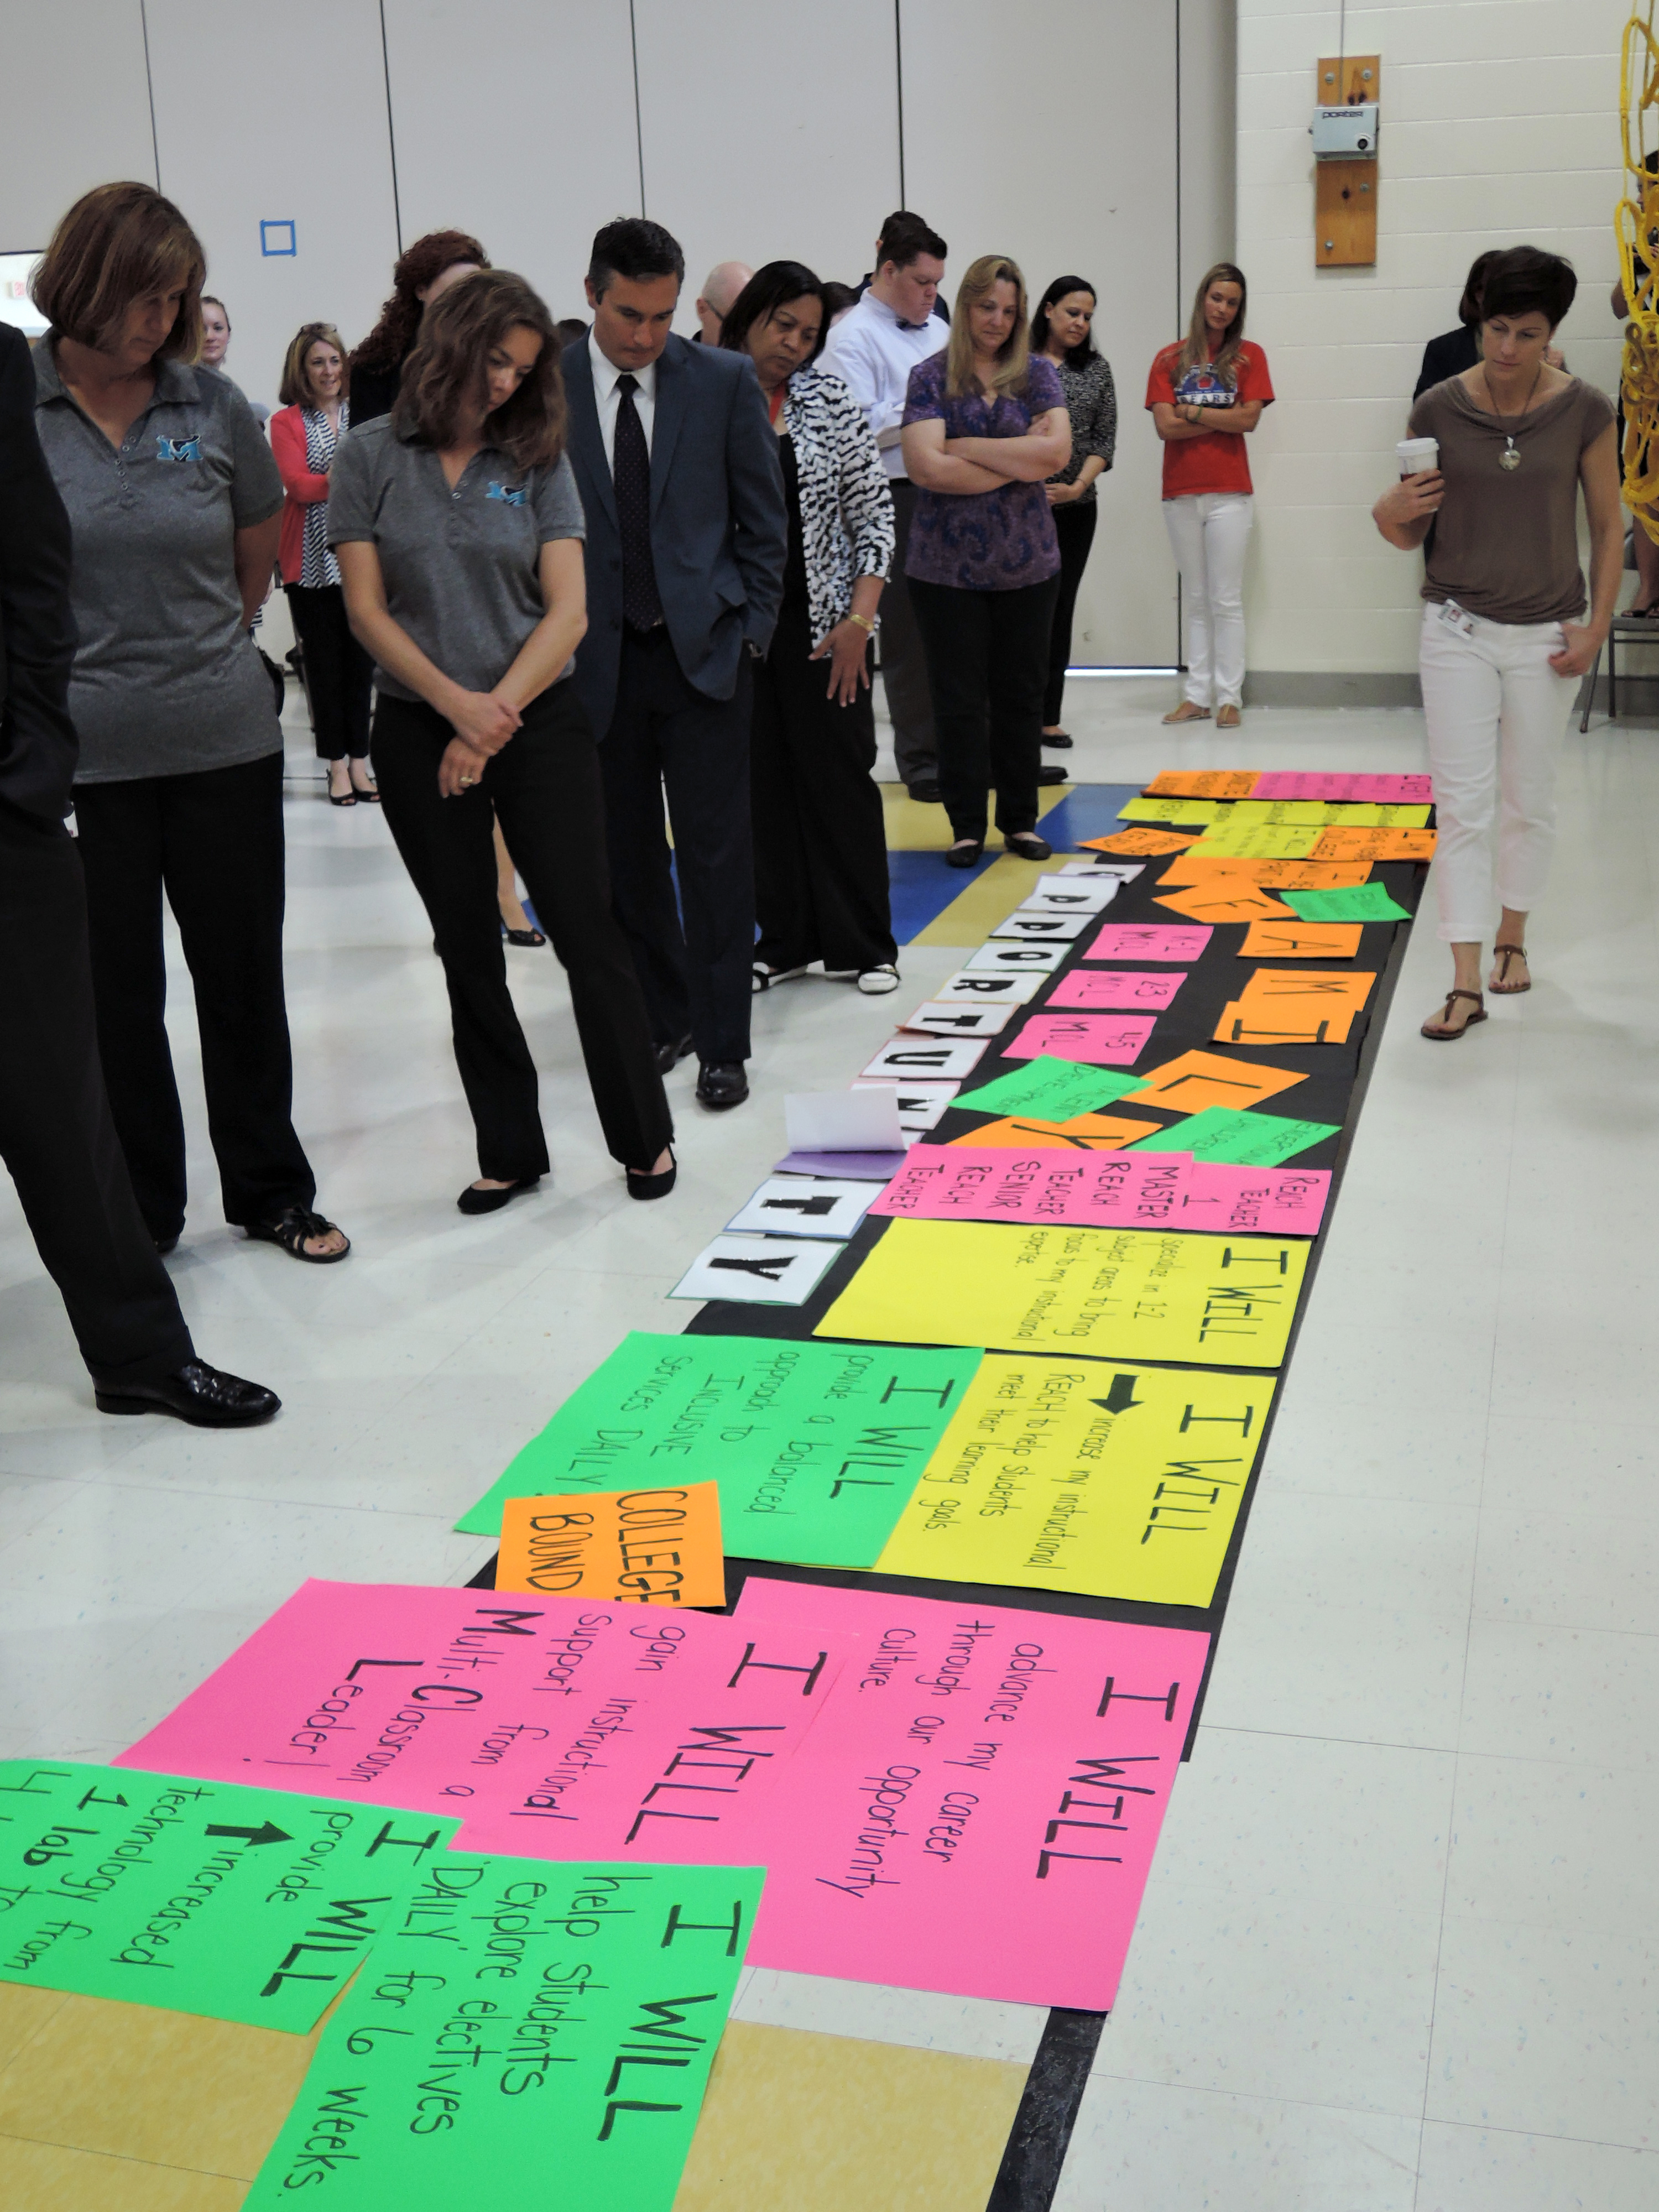 Charlotte school design meeting